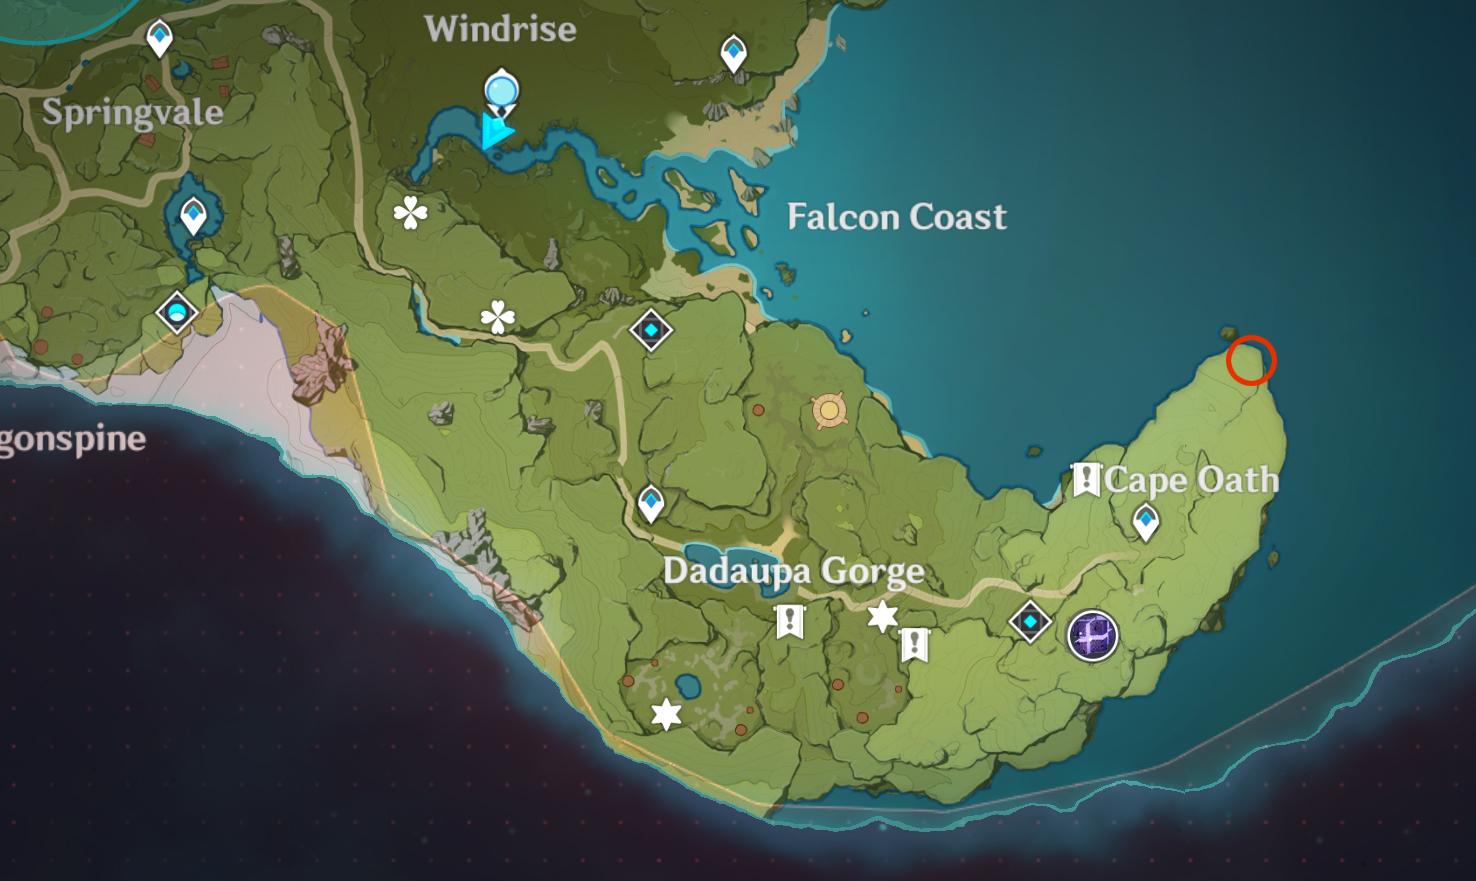 Lieu insolite de Hilichurl 5 - Cape Oath